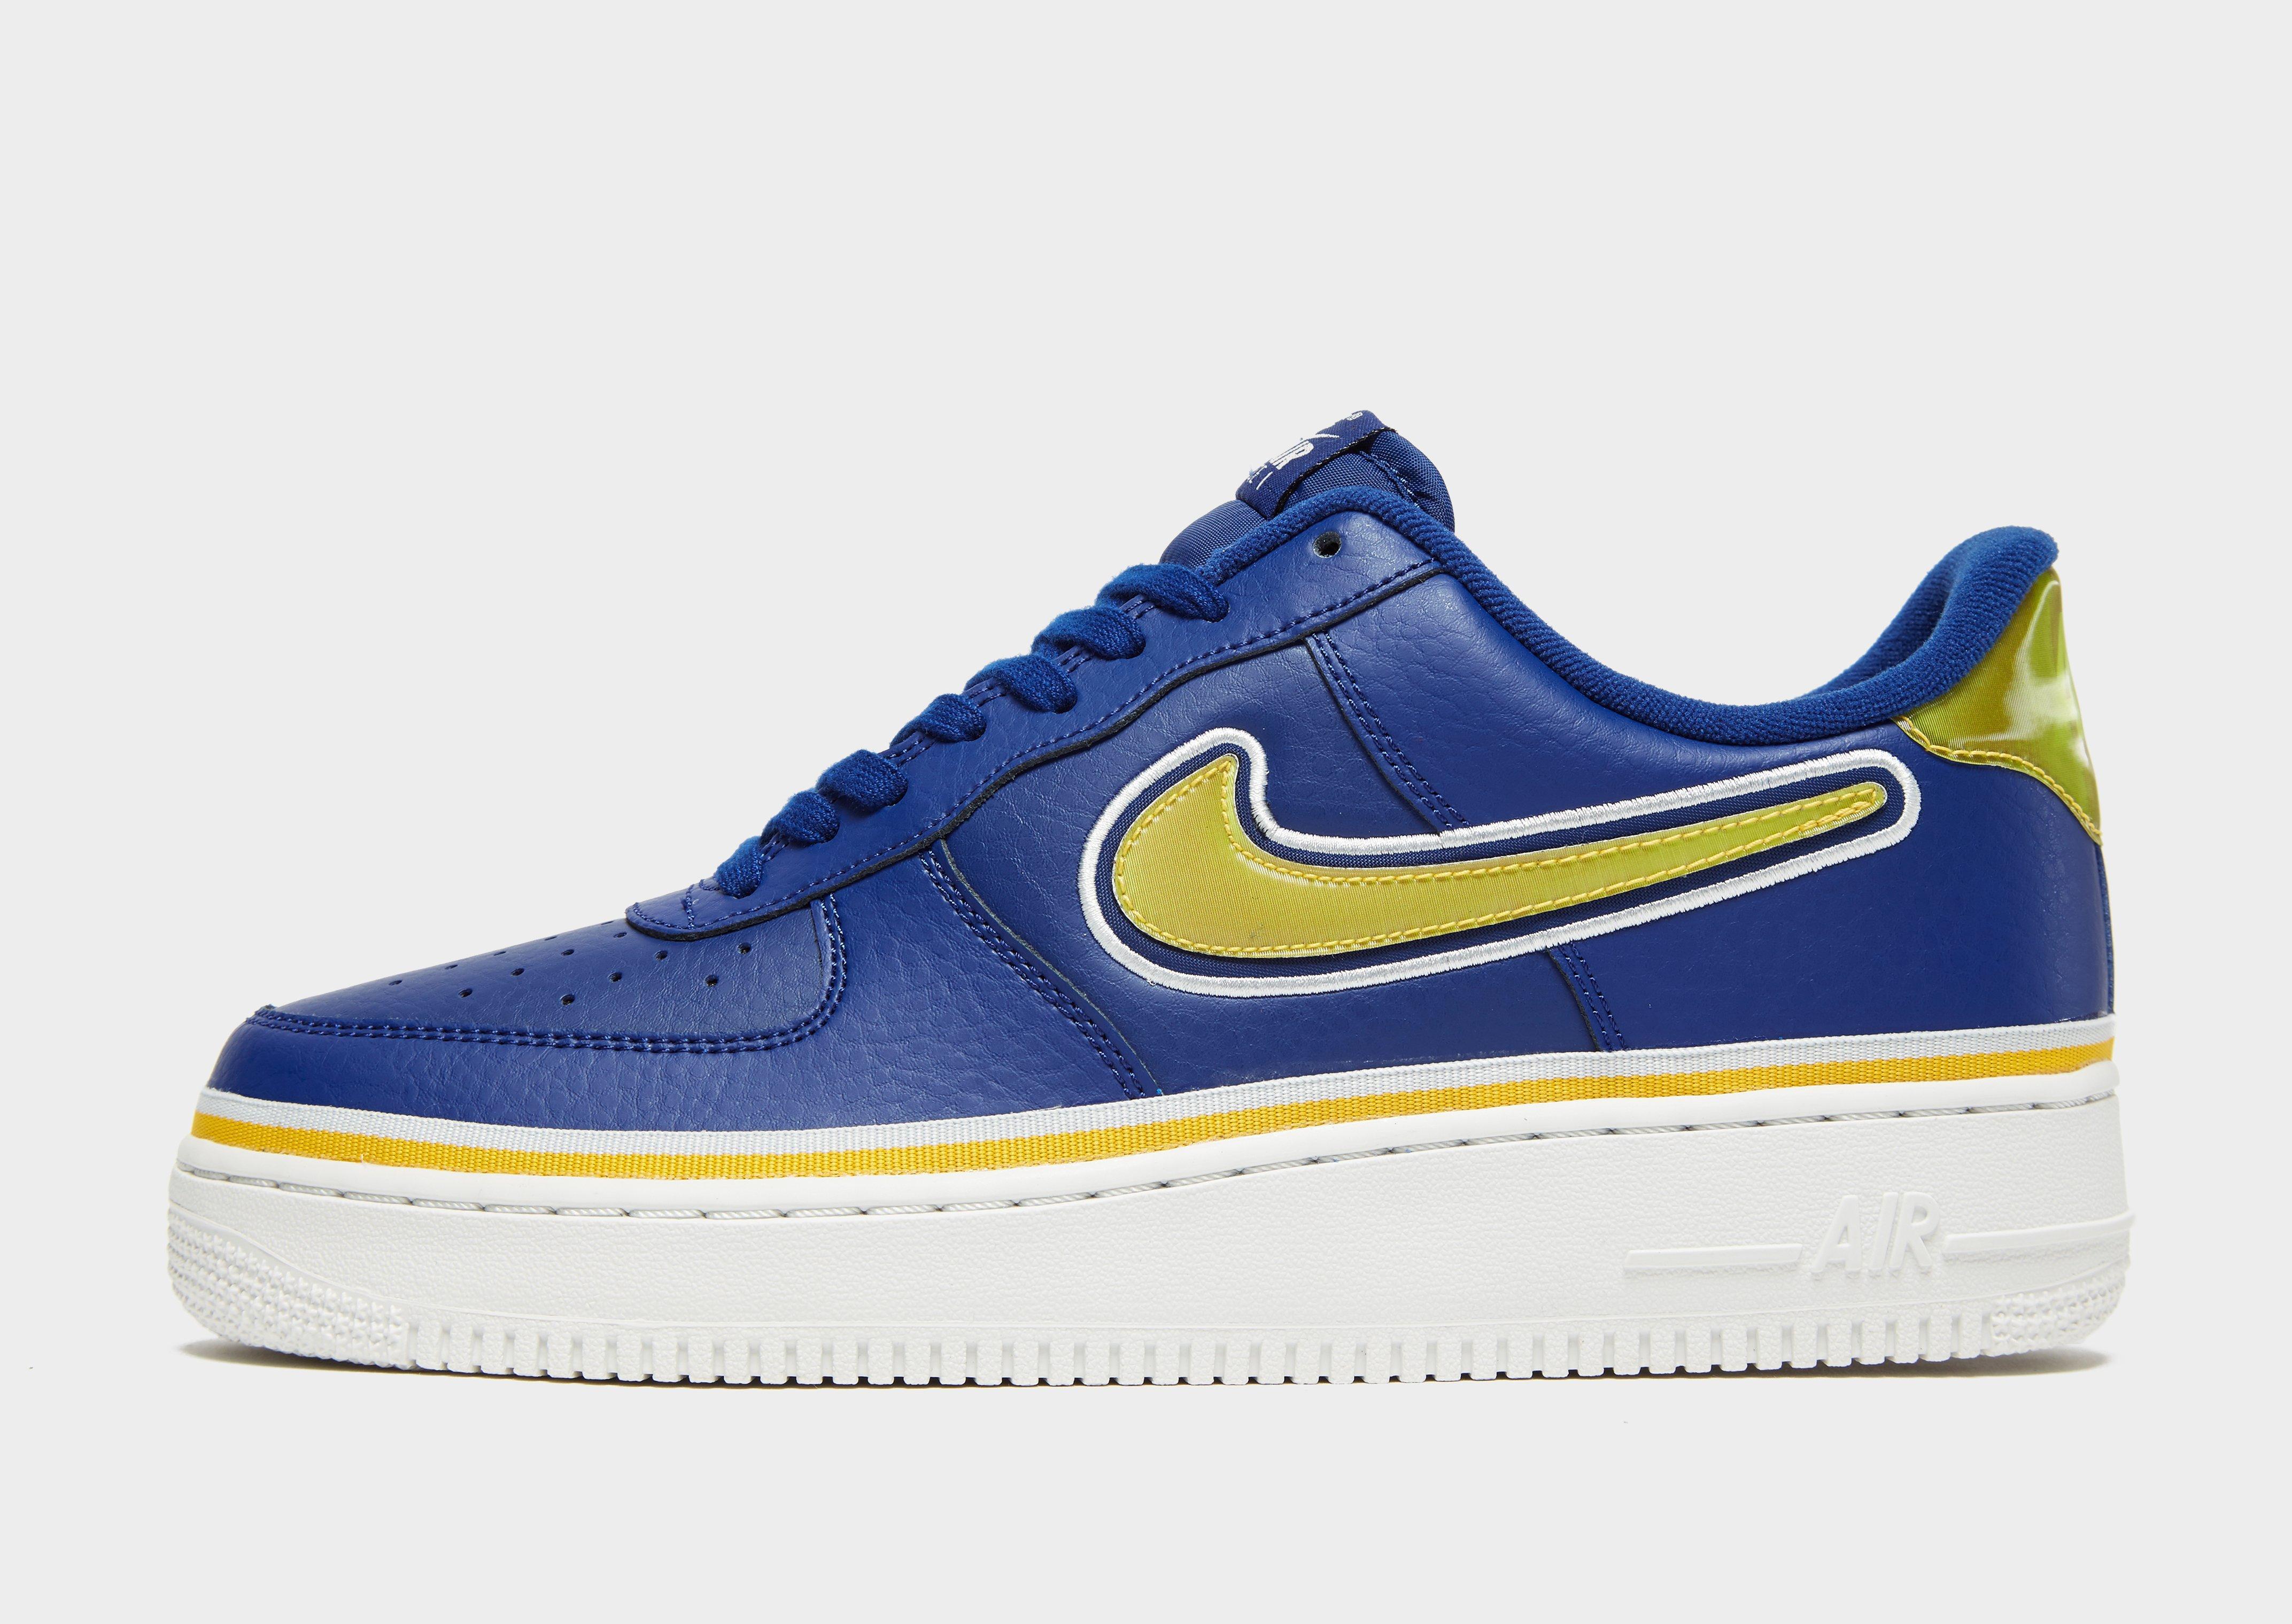 Nike Air 'nba' For Force Low Blue Men '07 1 Lv8 dtxoQshrCB